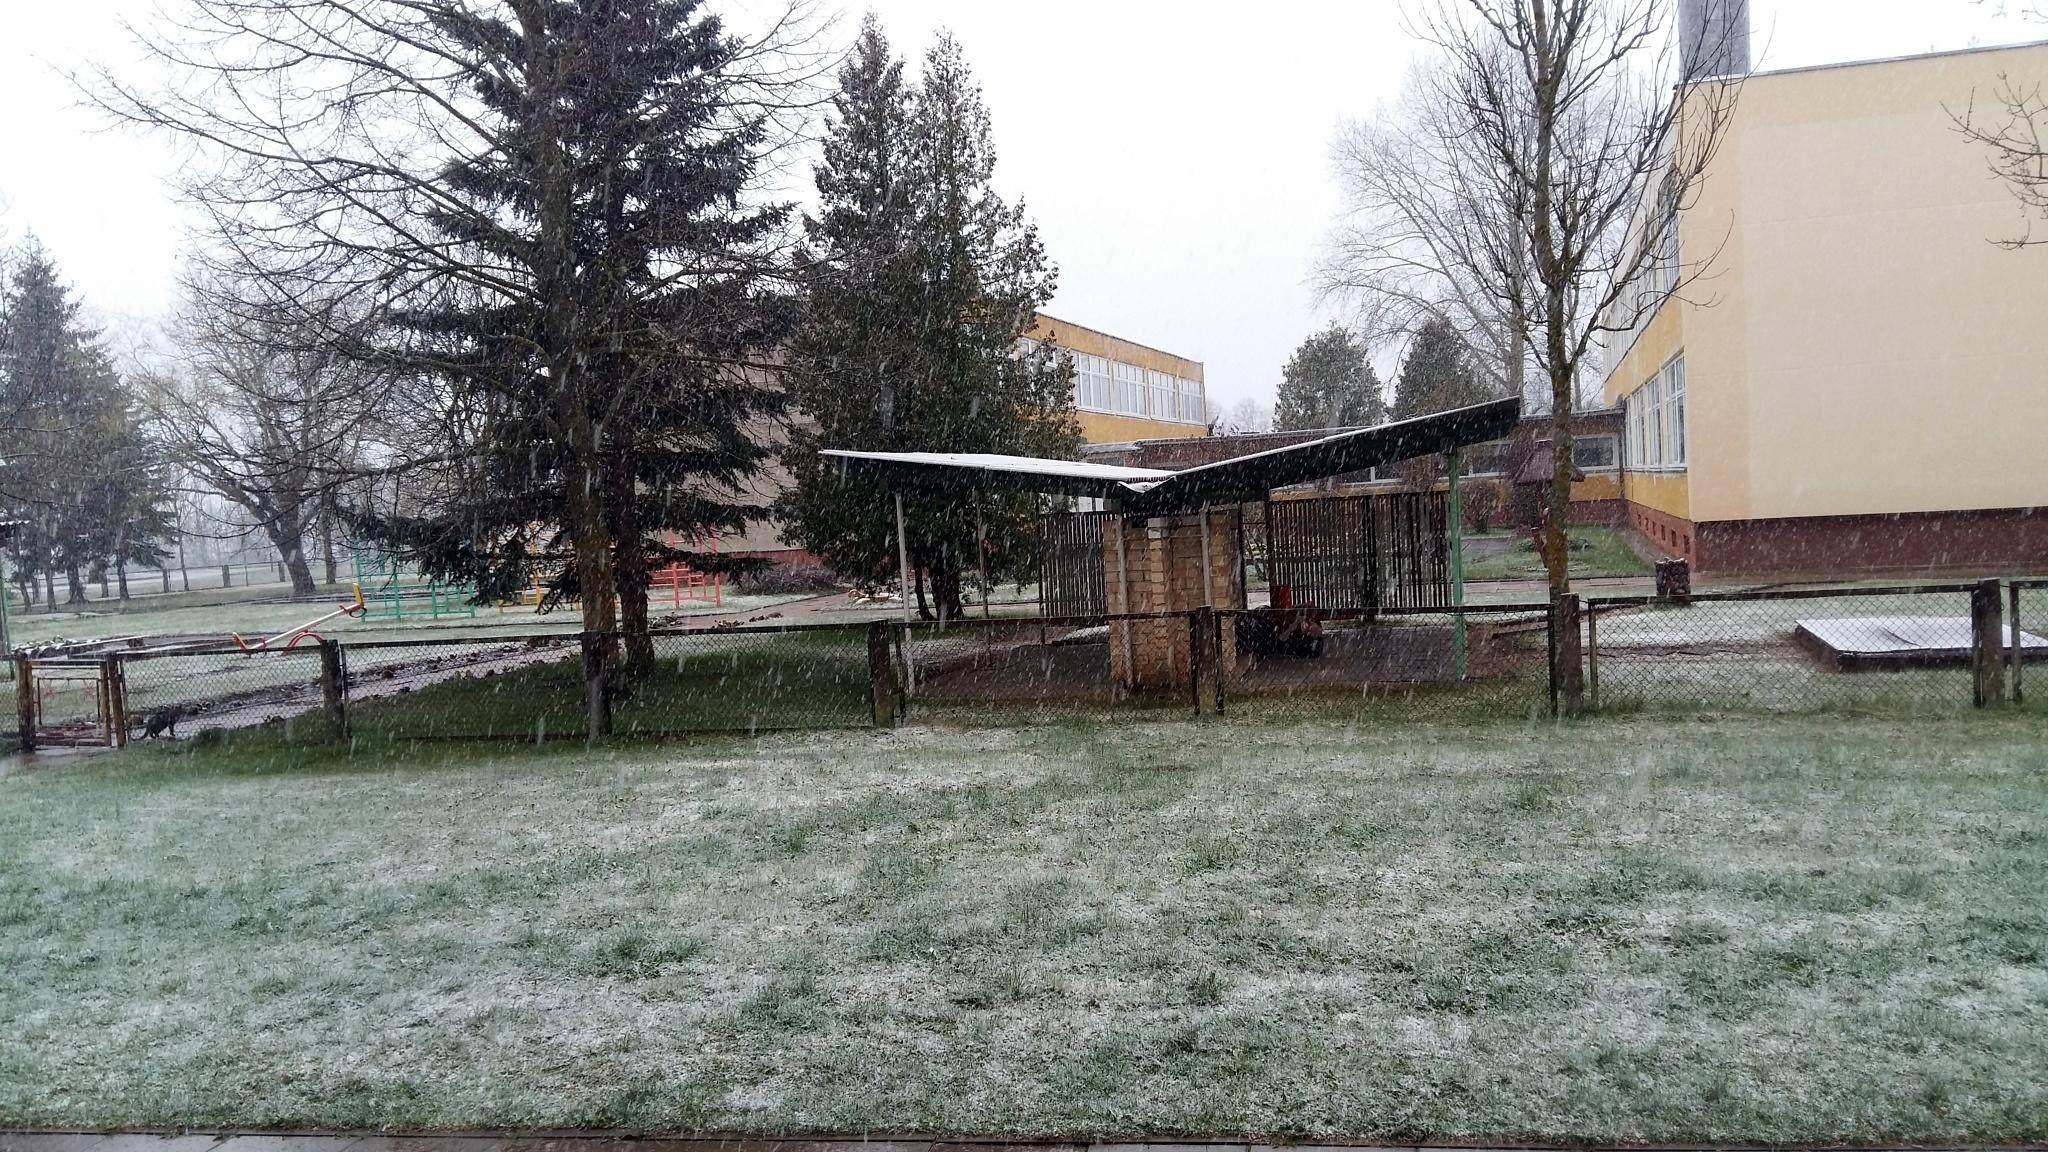 In spring. by uzkuraitiene62